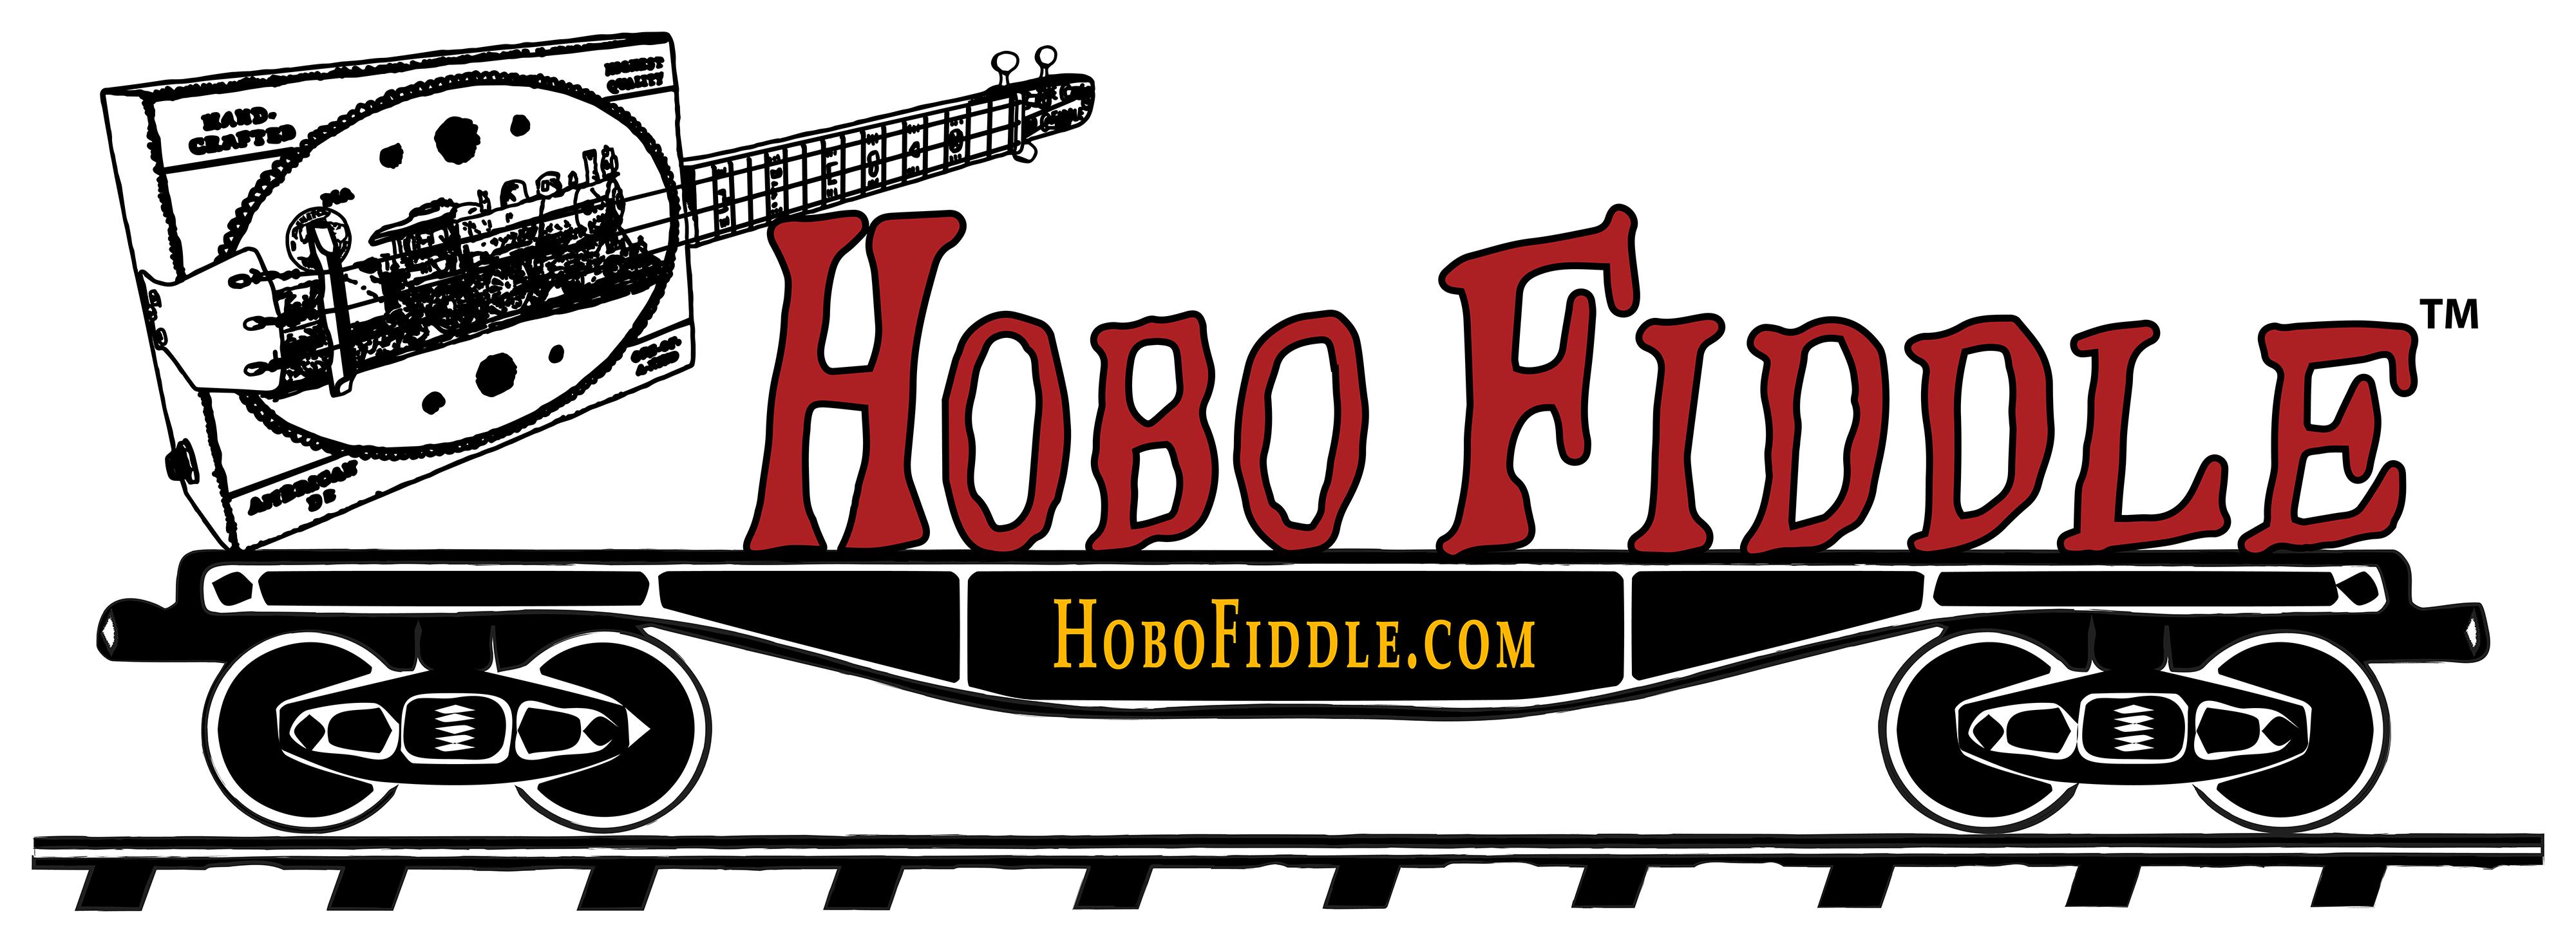 hobo-fiddle-logo-4000px.jpg